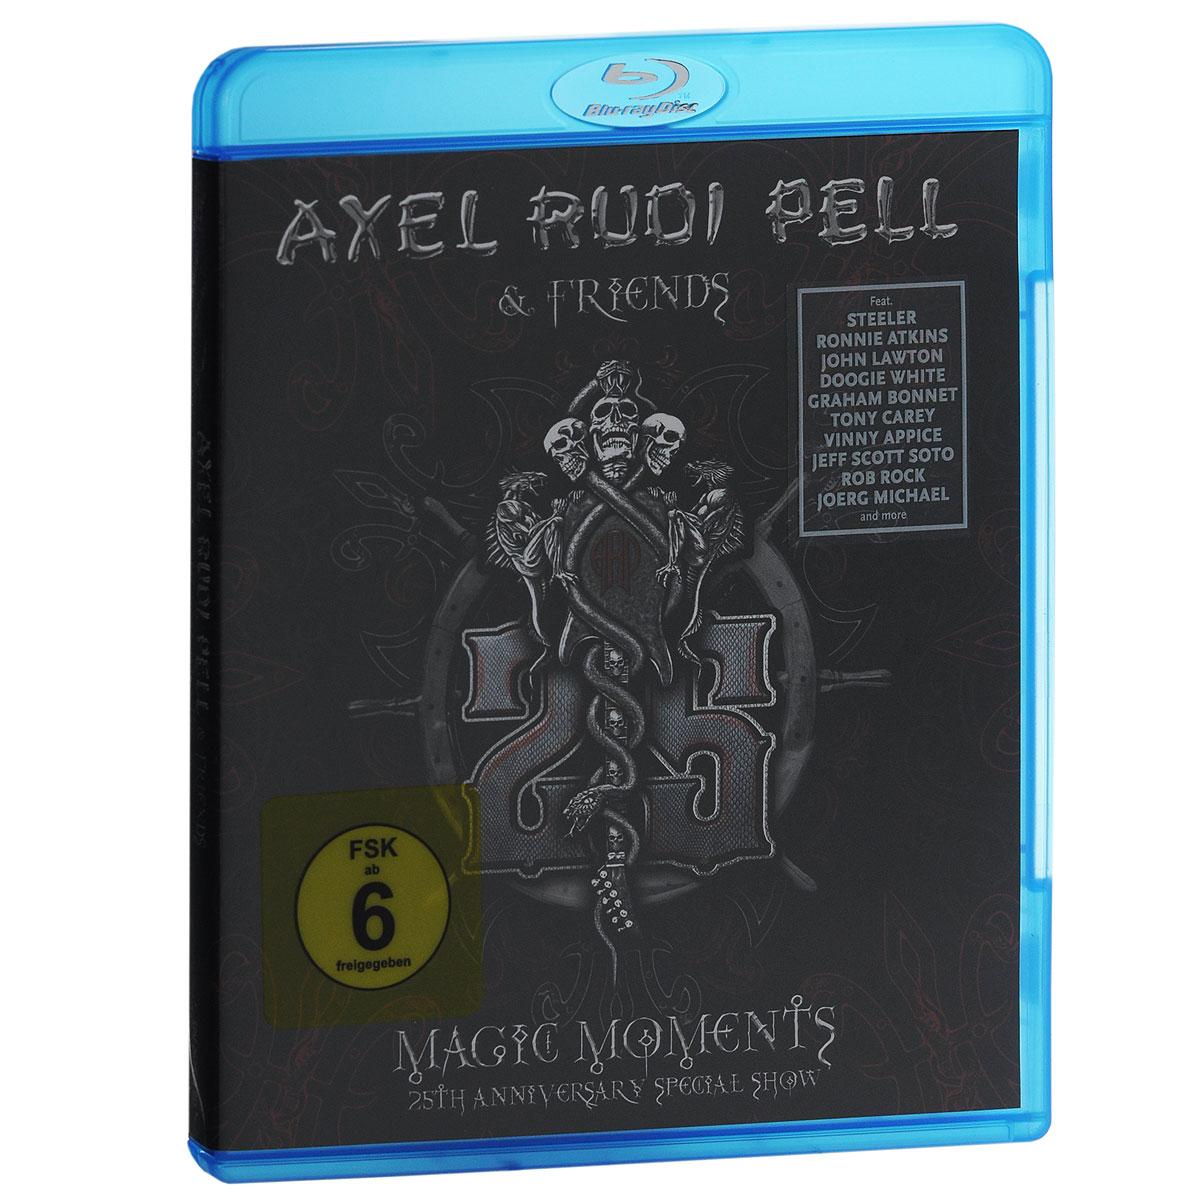 Axel Rudi Pell & Friends. Magic Moments. 25th Anniversary Special Show (Blu-ray) 2015